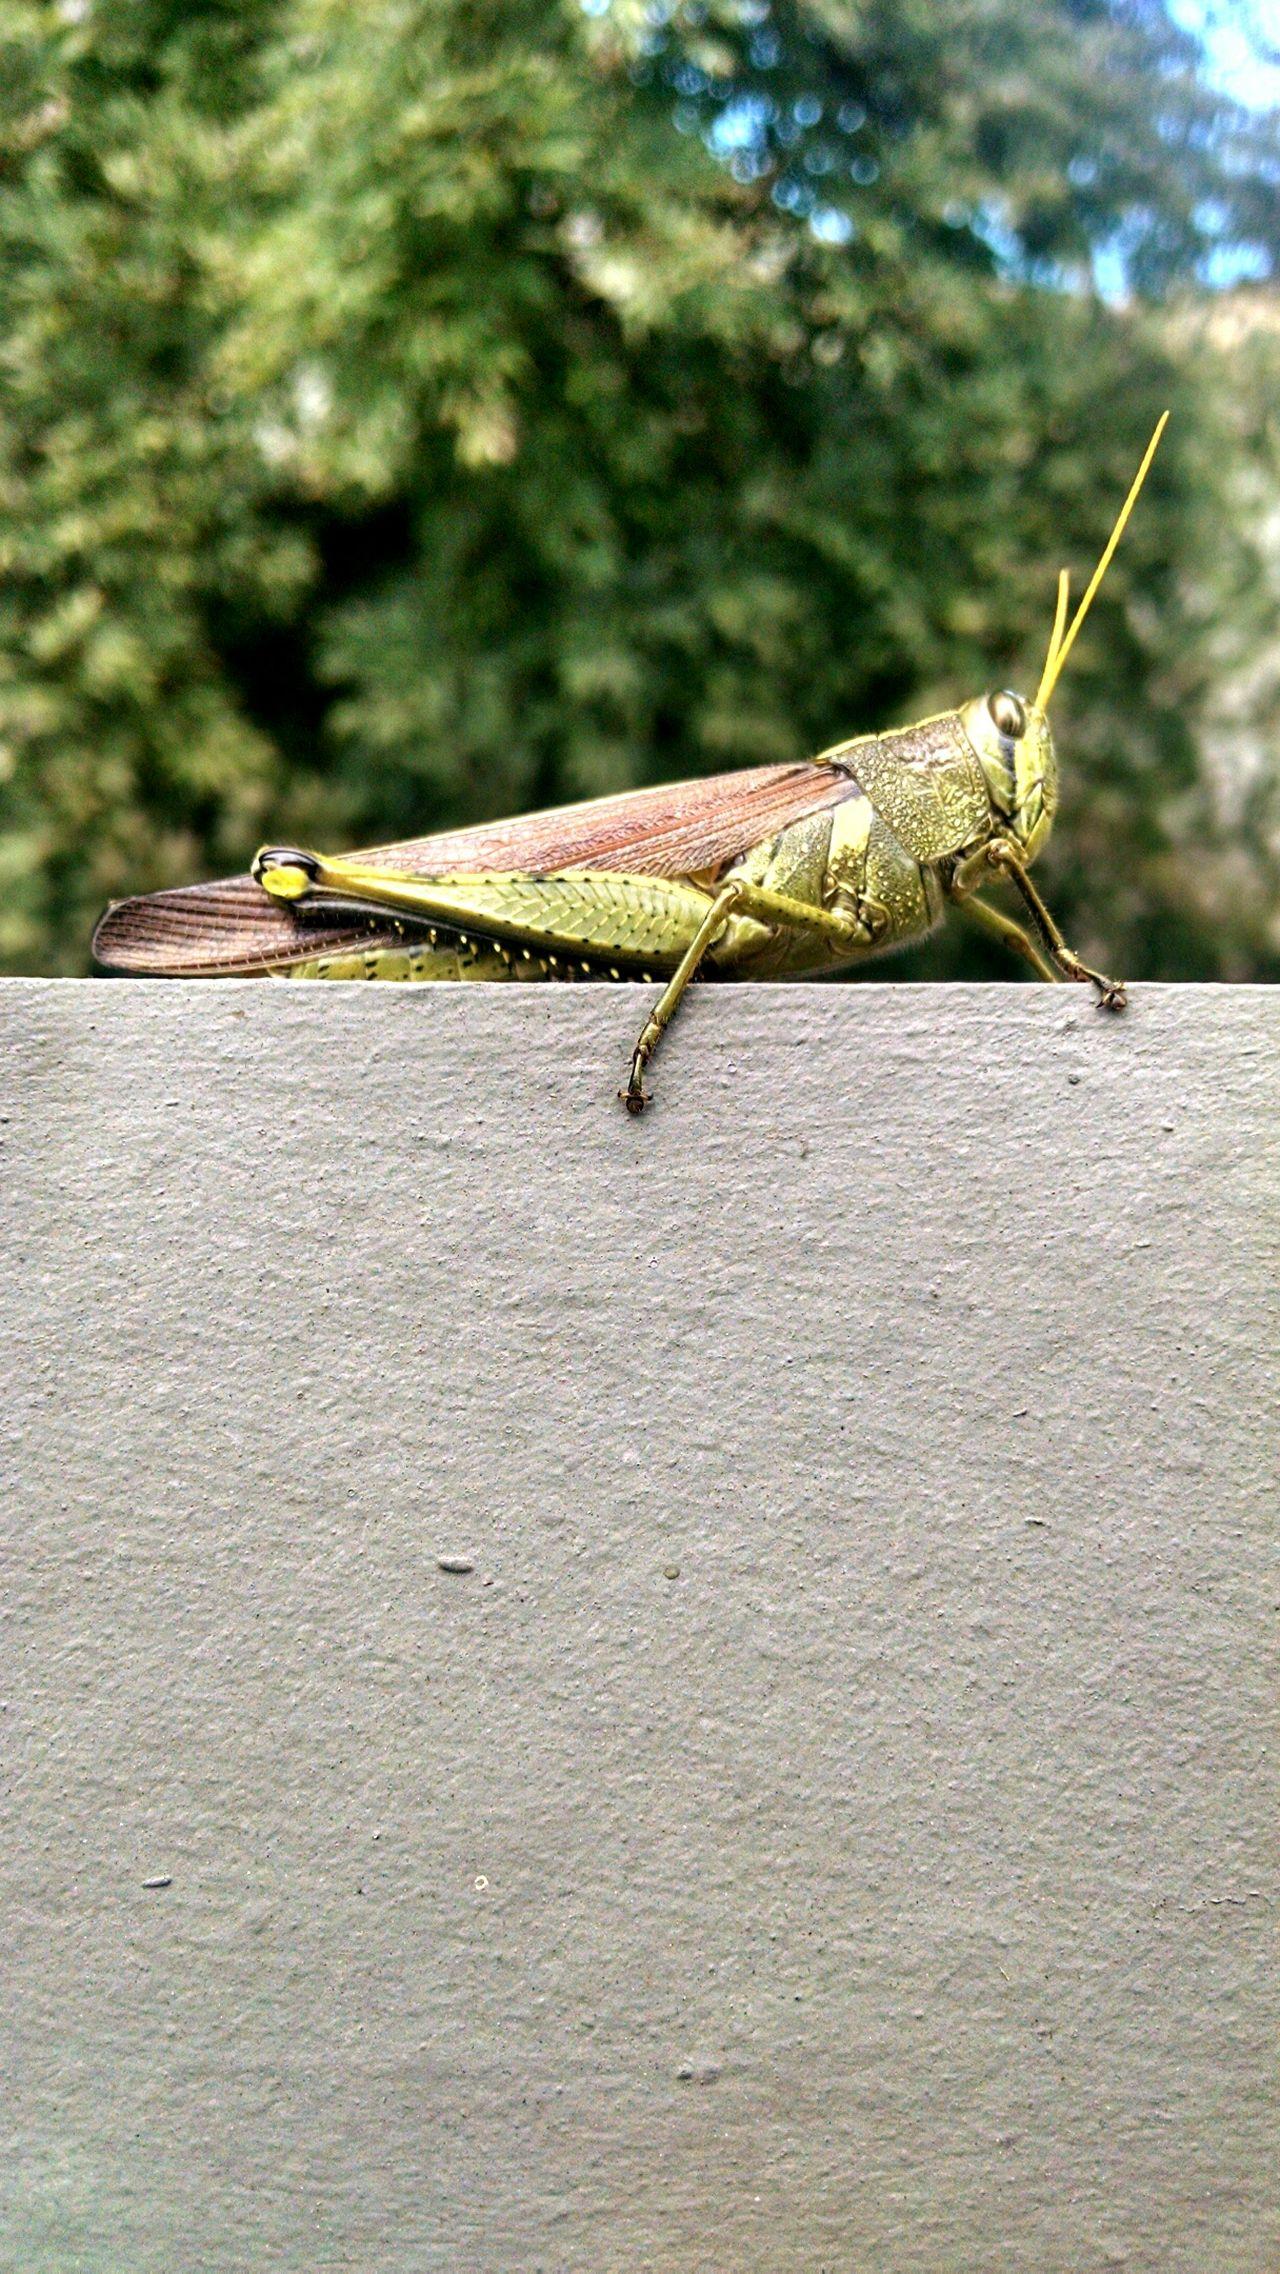 Cement Macro Grasshopper DistantFoliage Grains